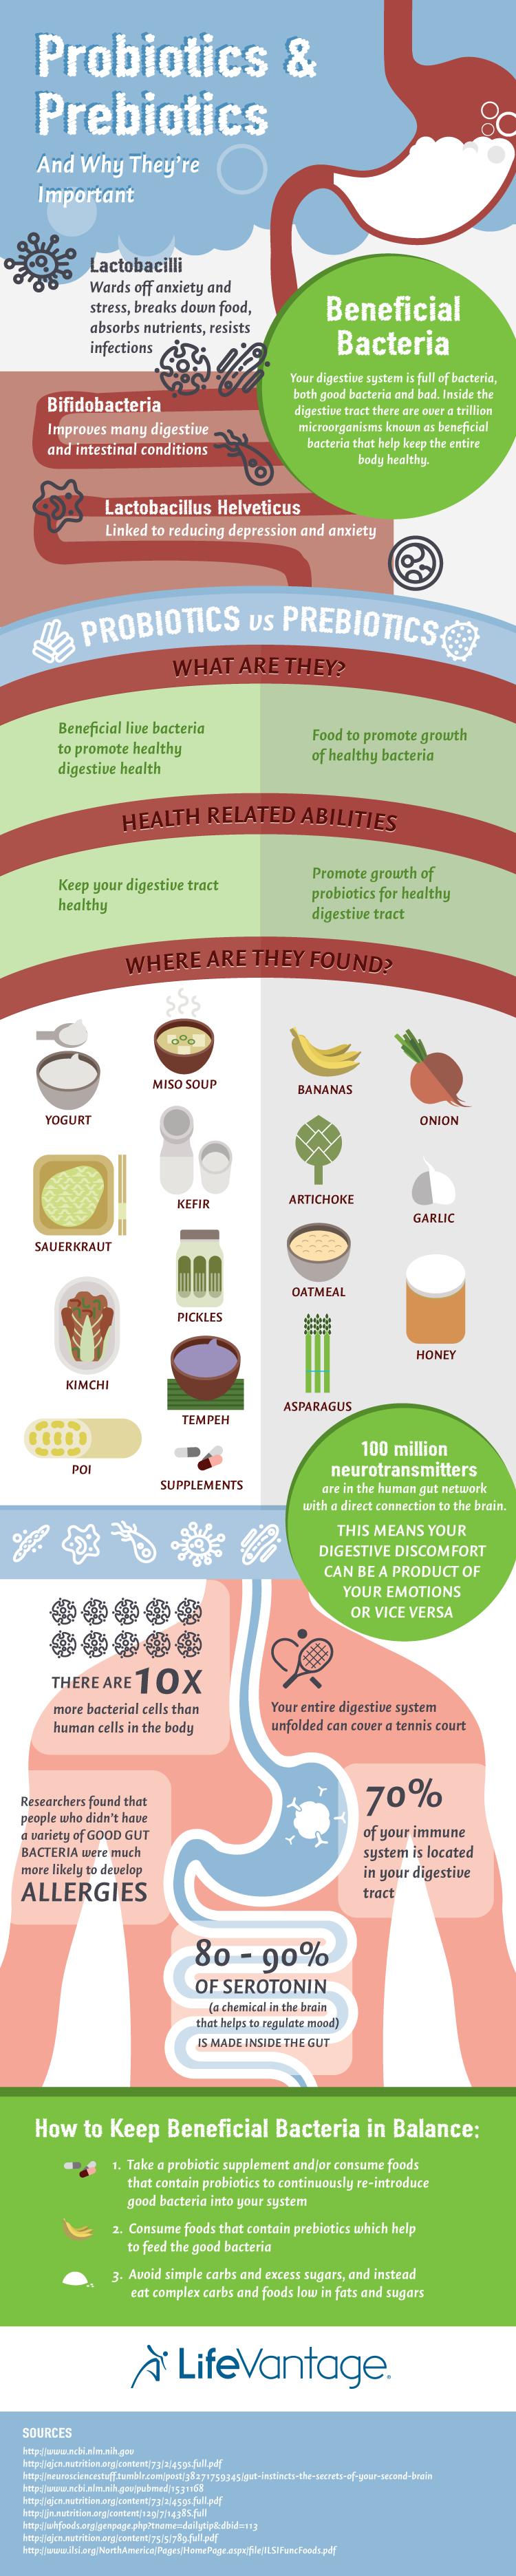 prebiotics and probiotics infographic